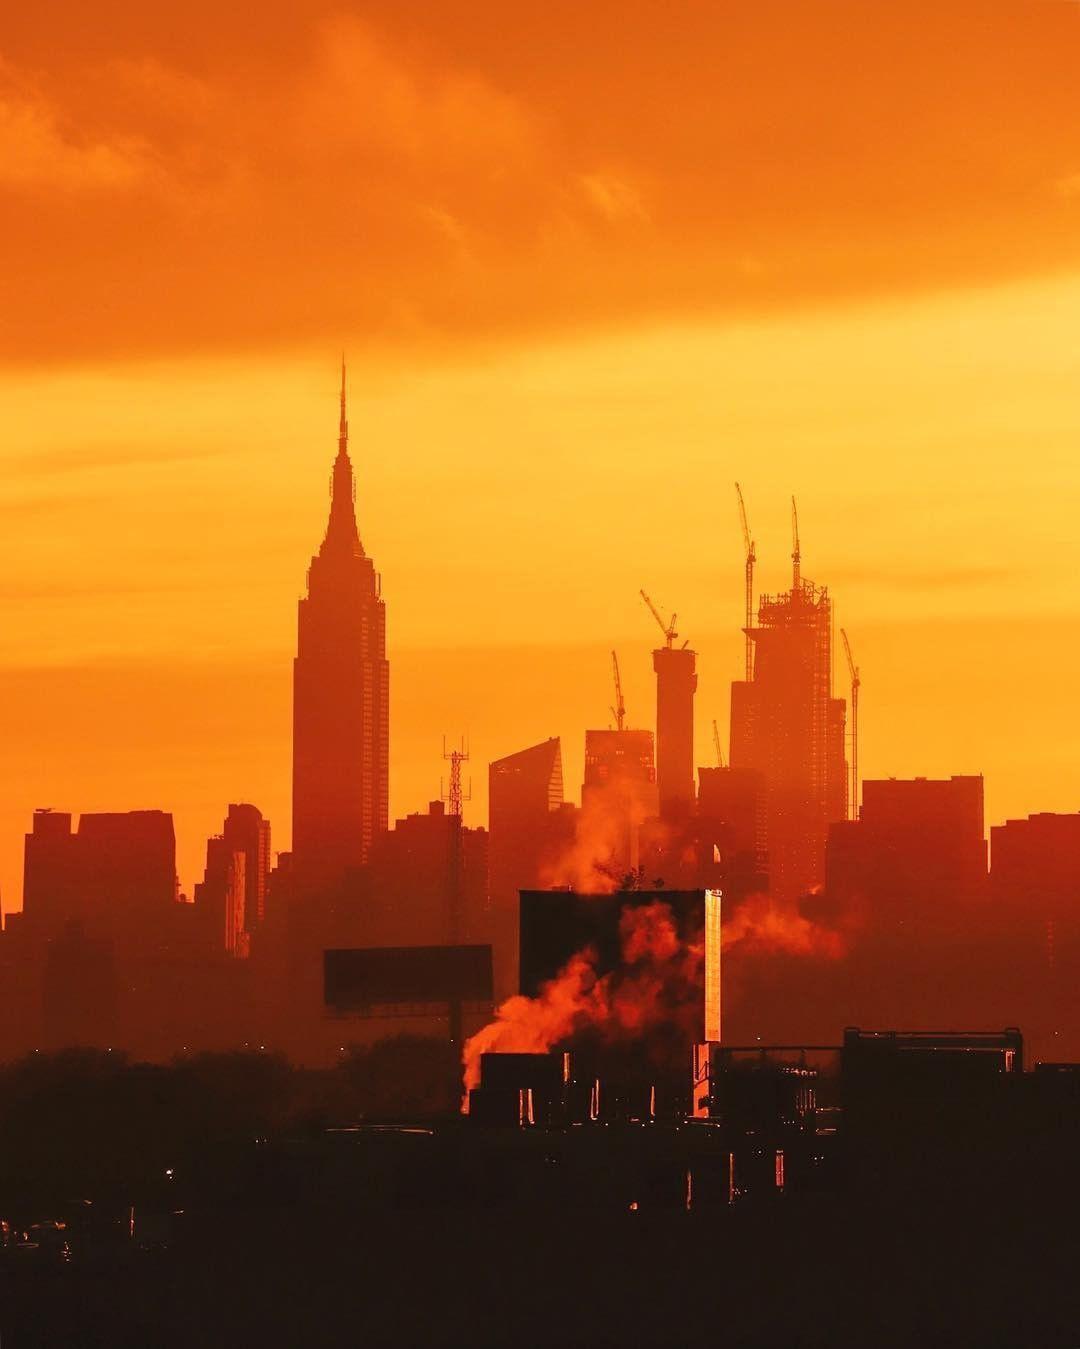 A Striking Orange Sunset Over Manhattan Phot Sunset City Photo New York